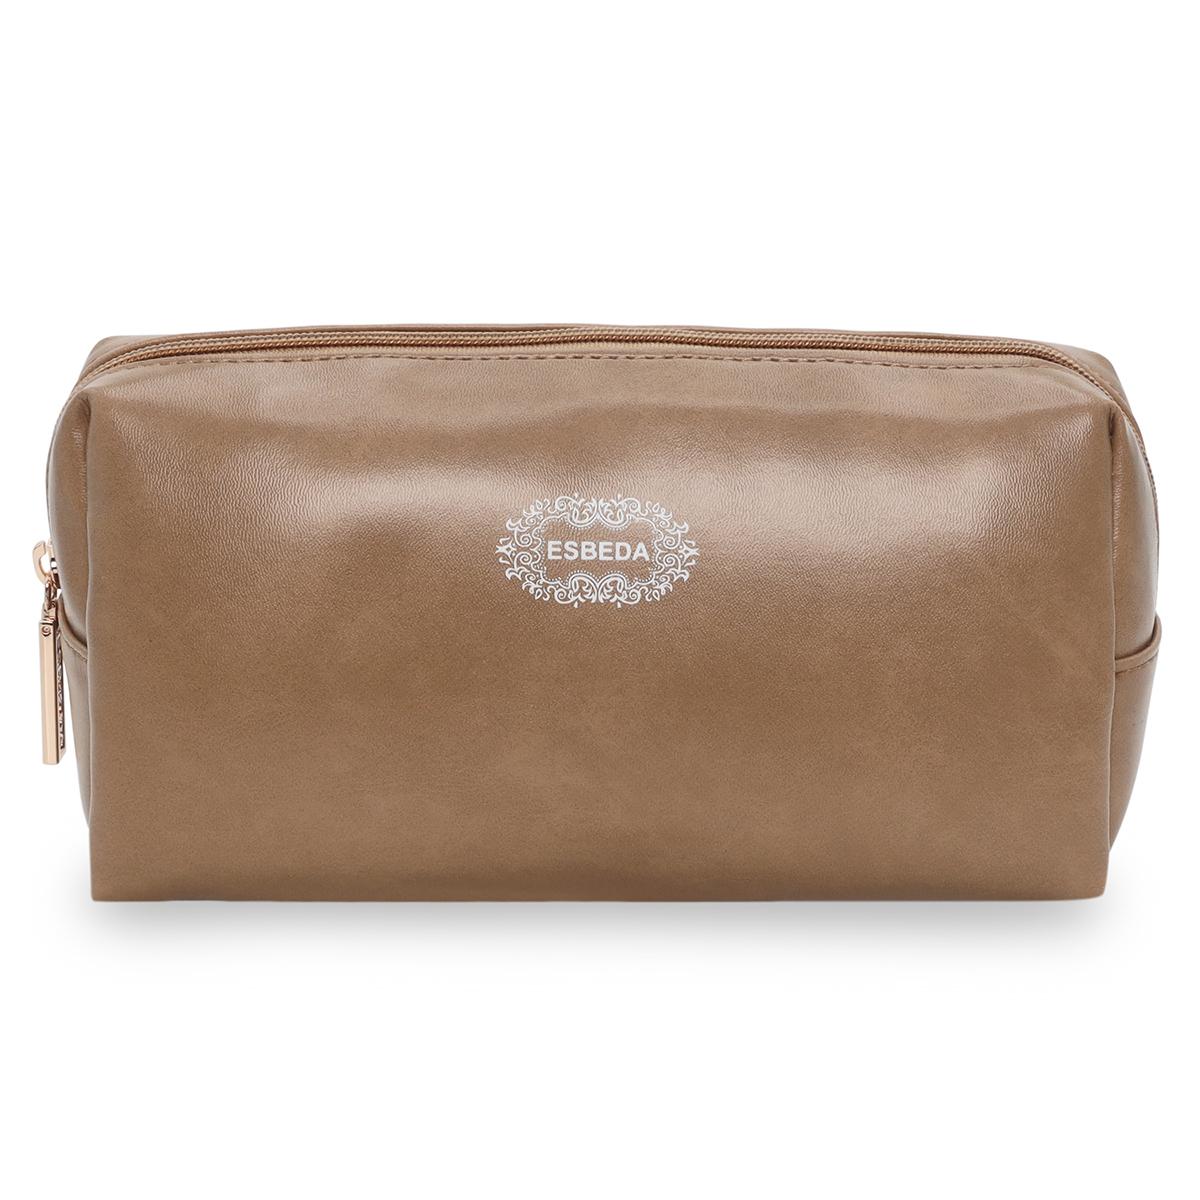 ESBEDA | ESBEDA Simple Beige Color Cosmetic Bag Portable Makeup Pouch for Women Multifunctional Travel Storage Toiletry Bag